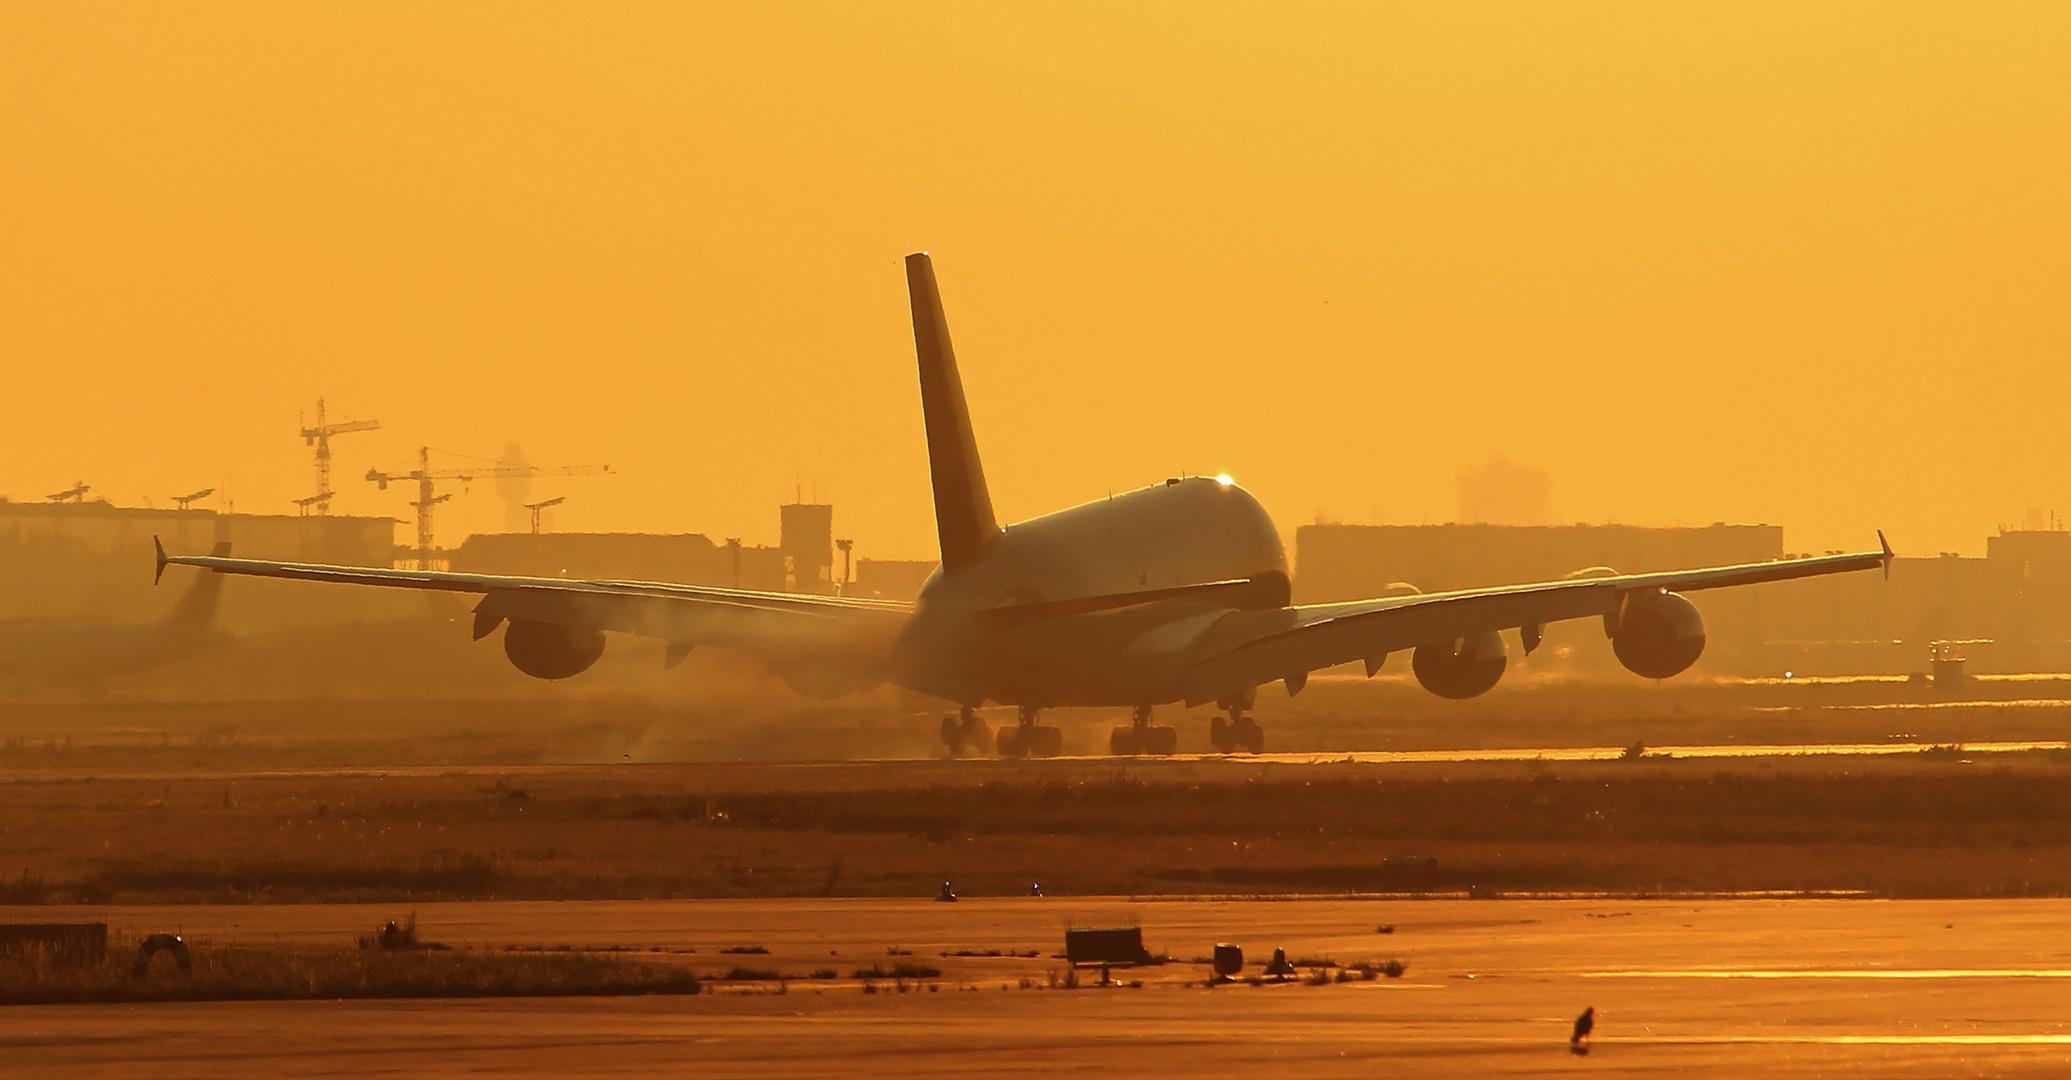 Landung im schönen Sonnenaufgang